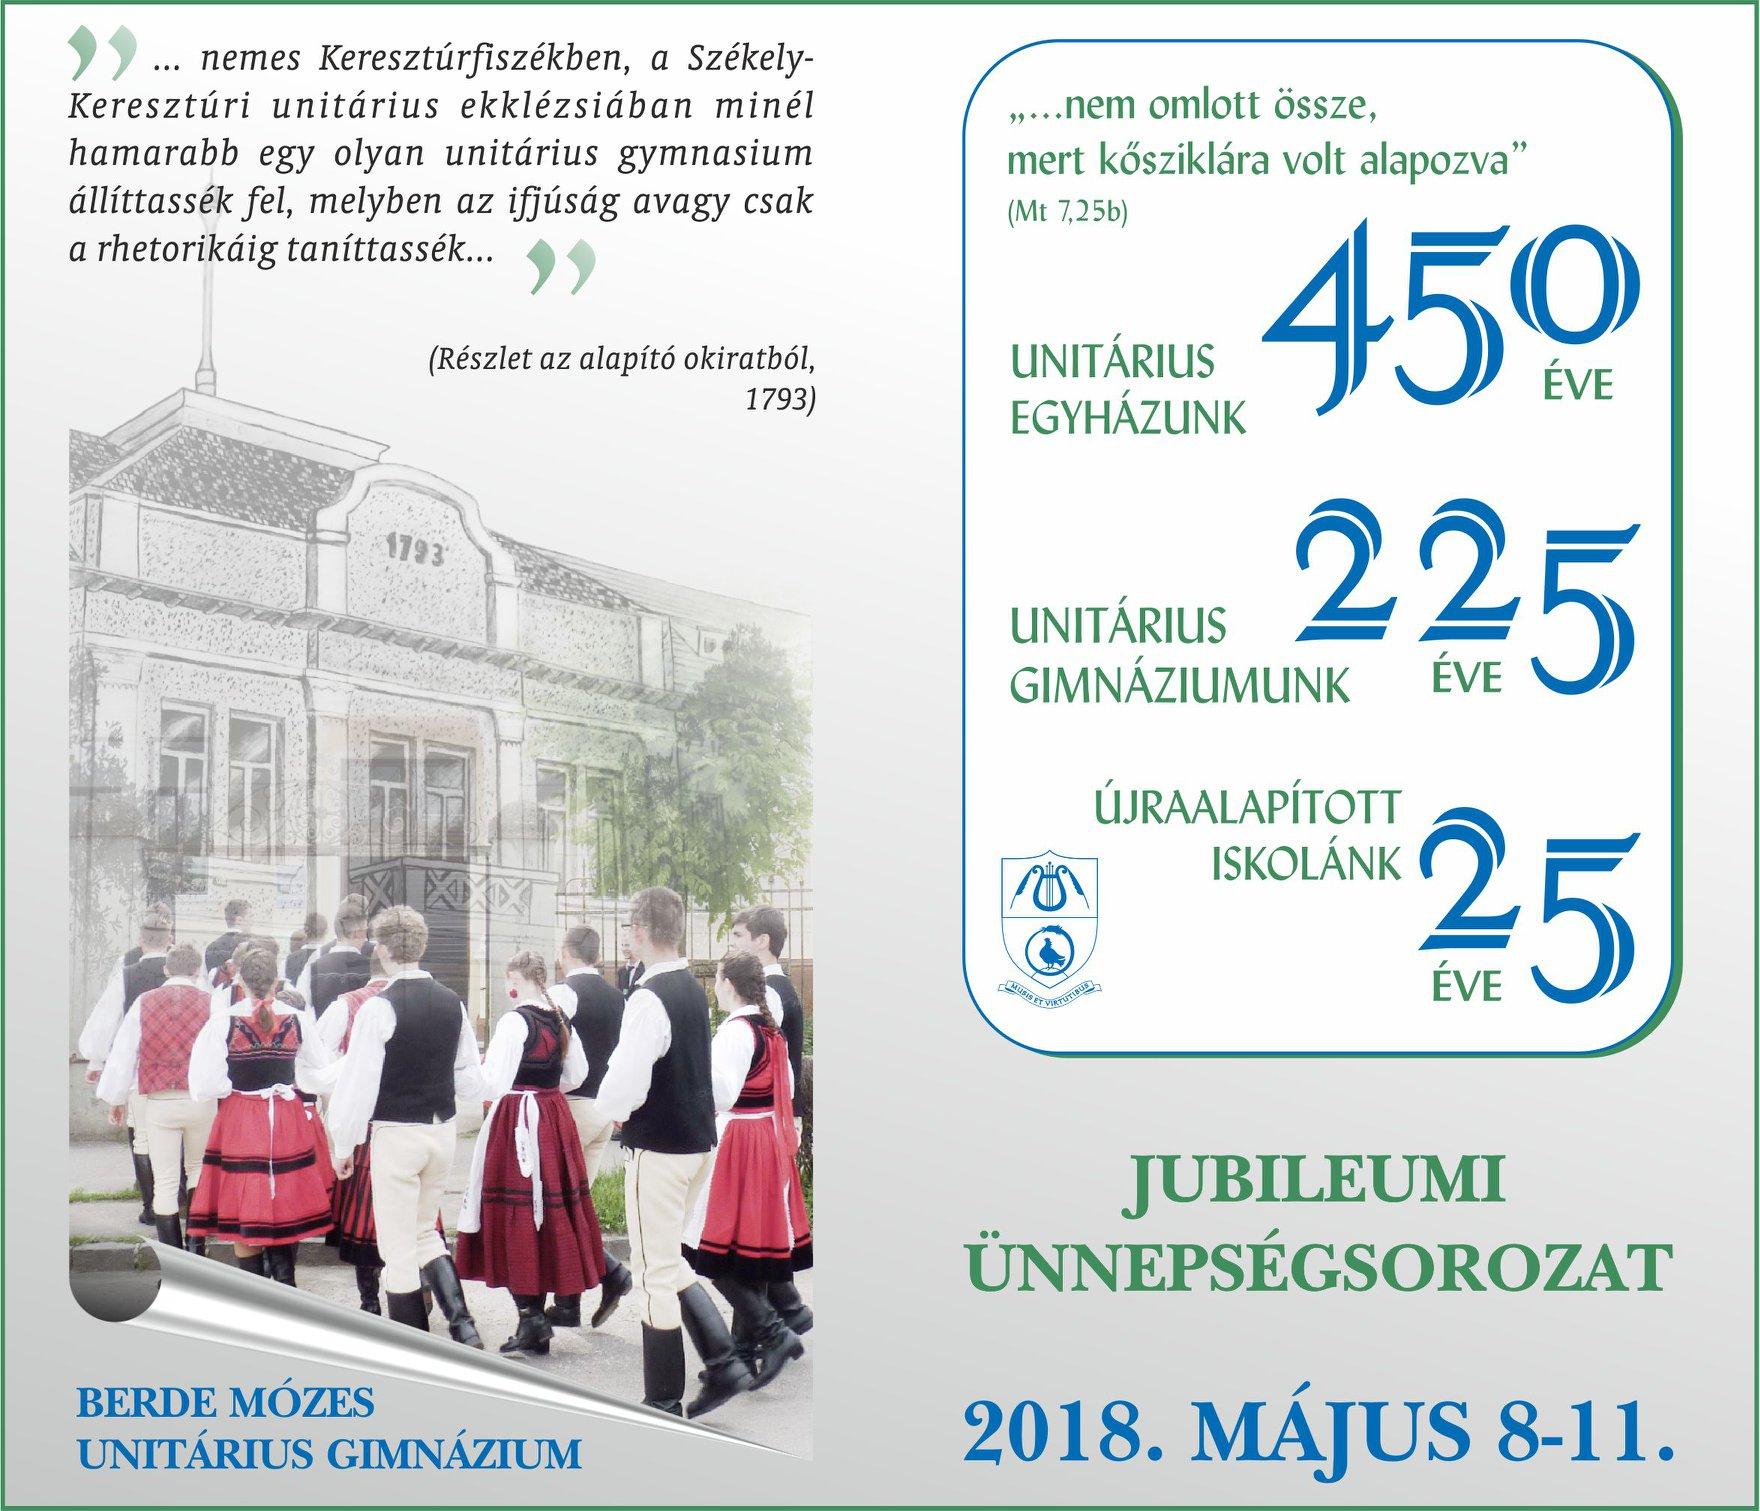 Berde Mózes Unitárius Gimnázium jubileumi ünnepségsorozat